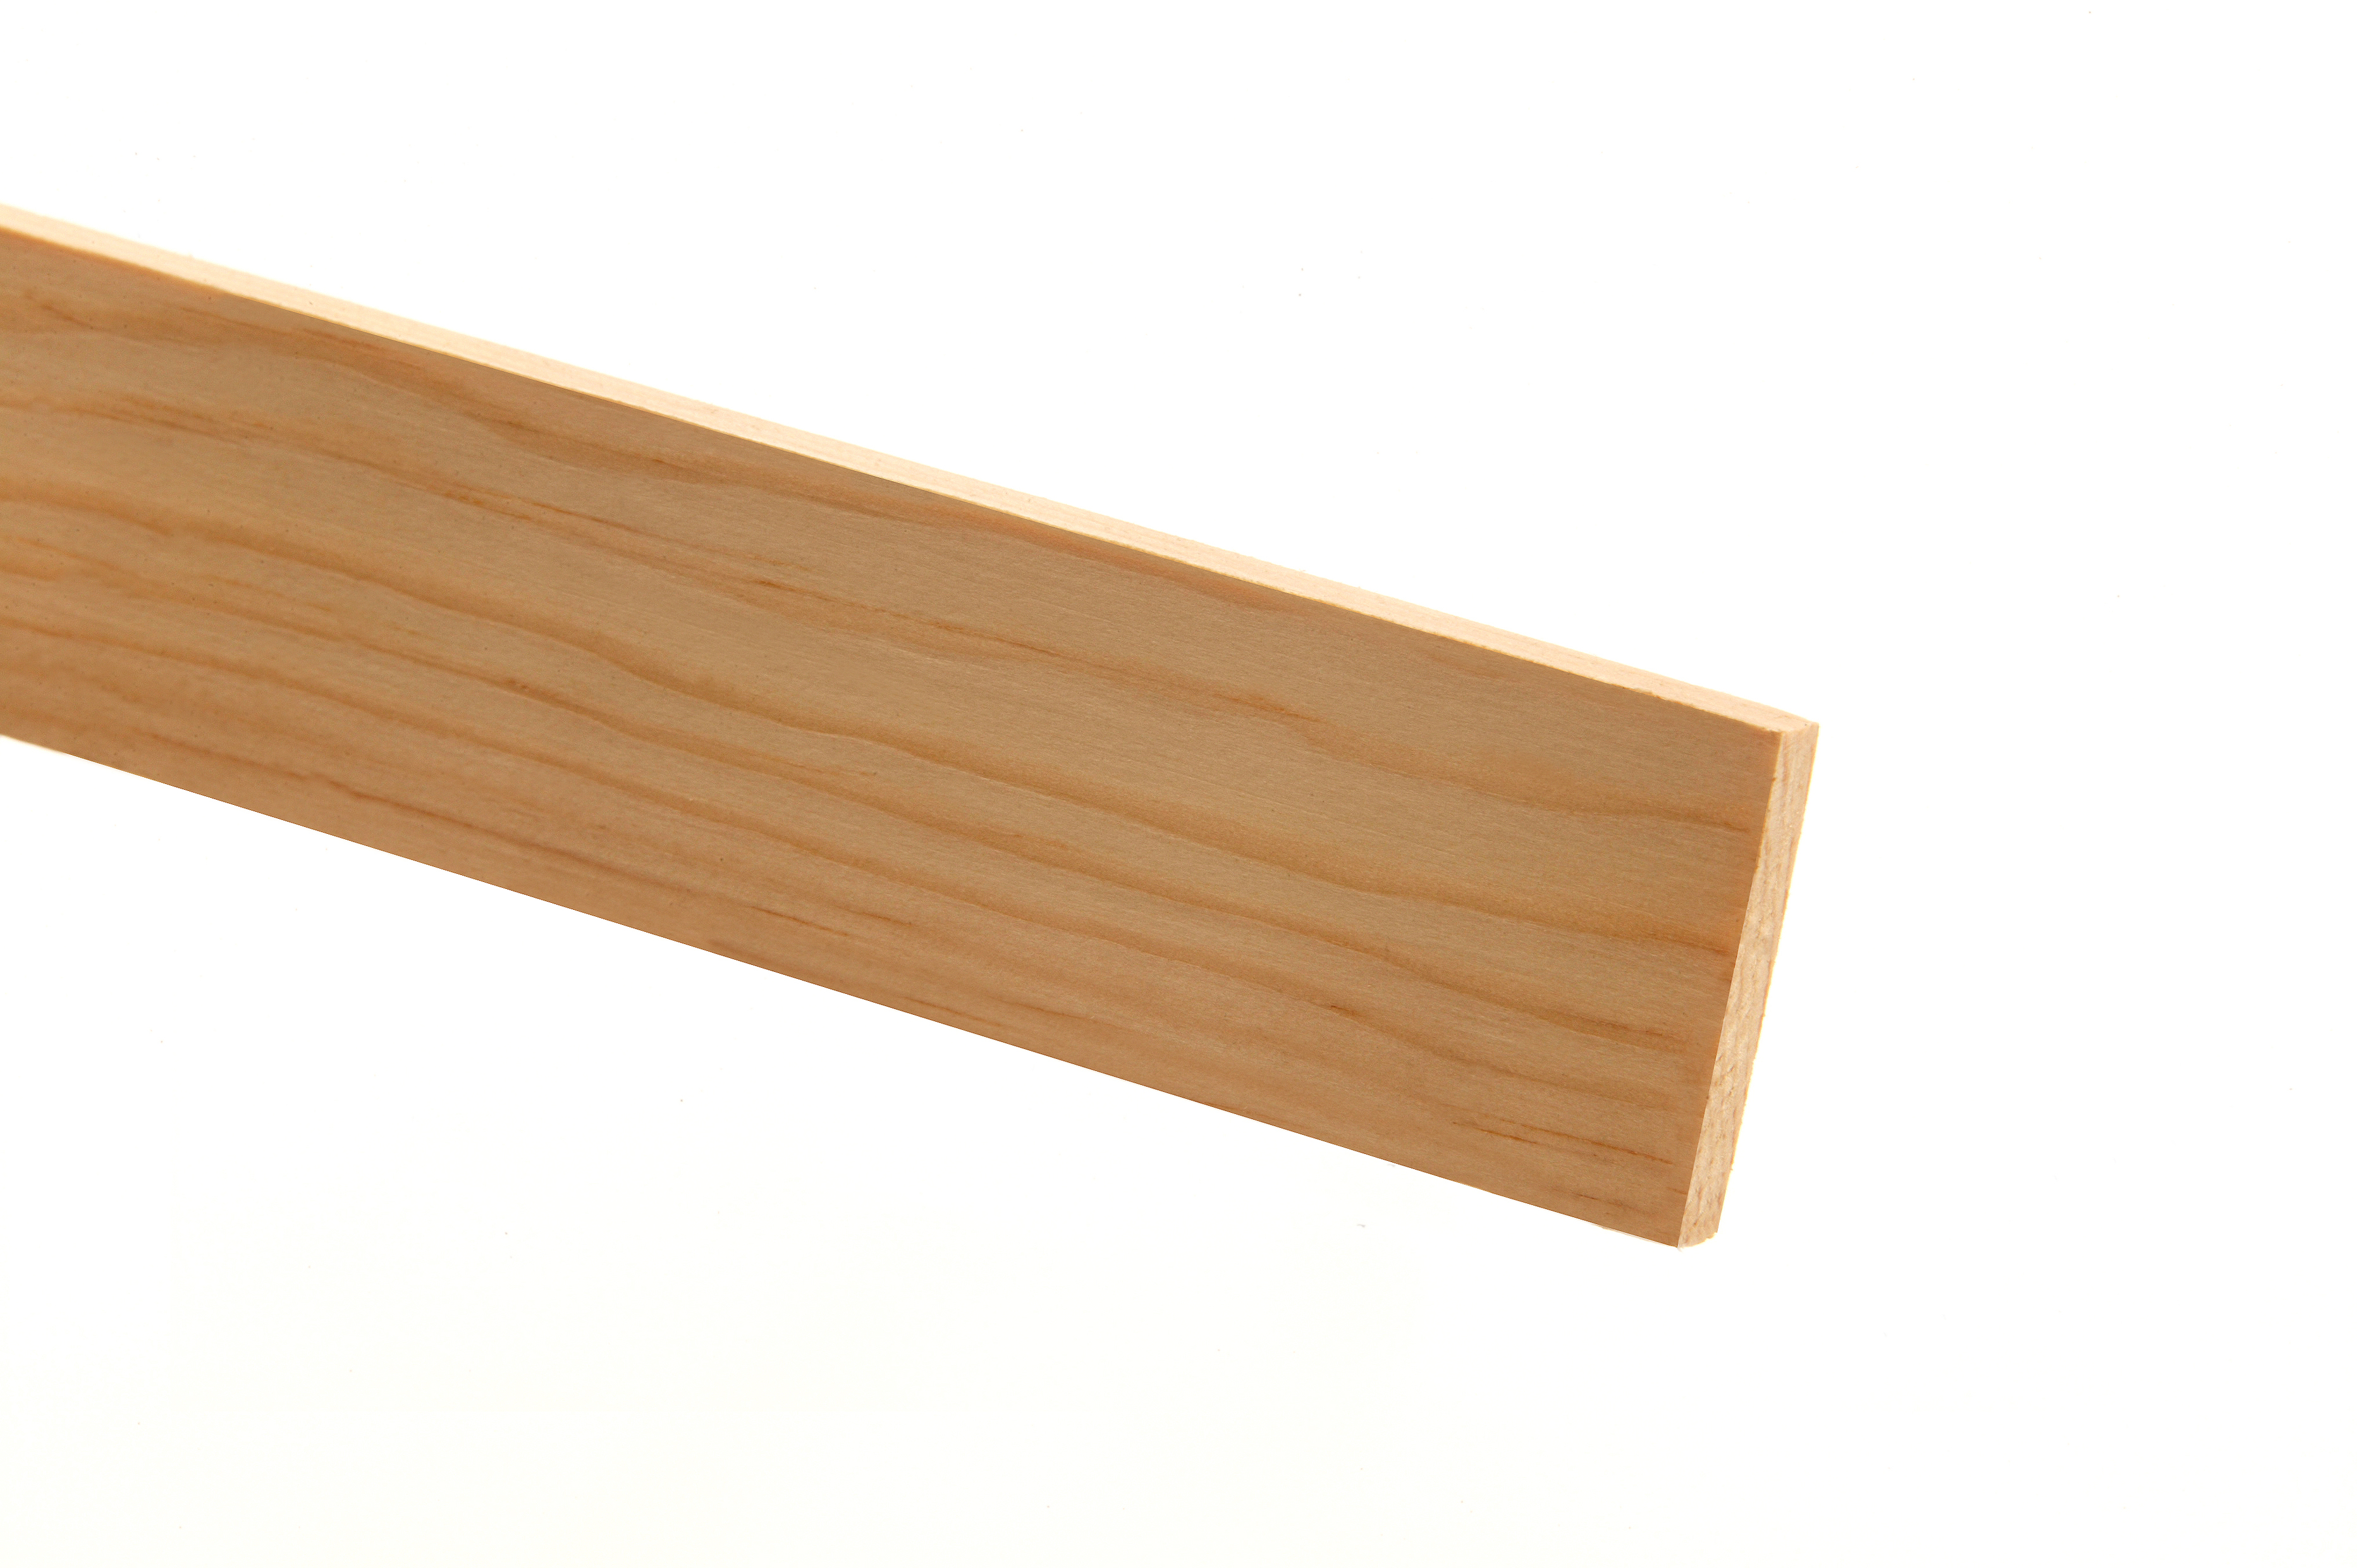 10 Pine PSE Stripwood 10.5 x 92 x 2400mm